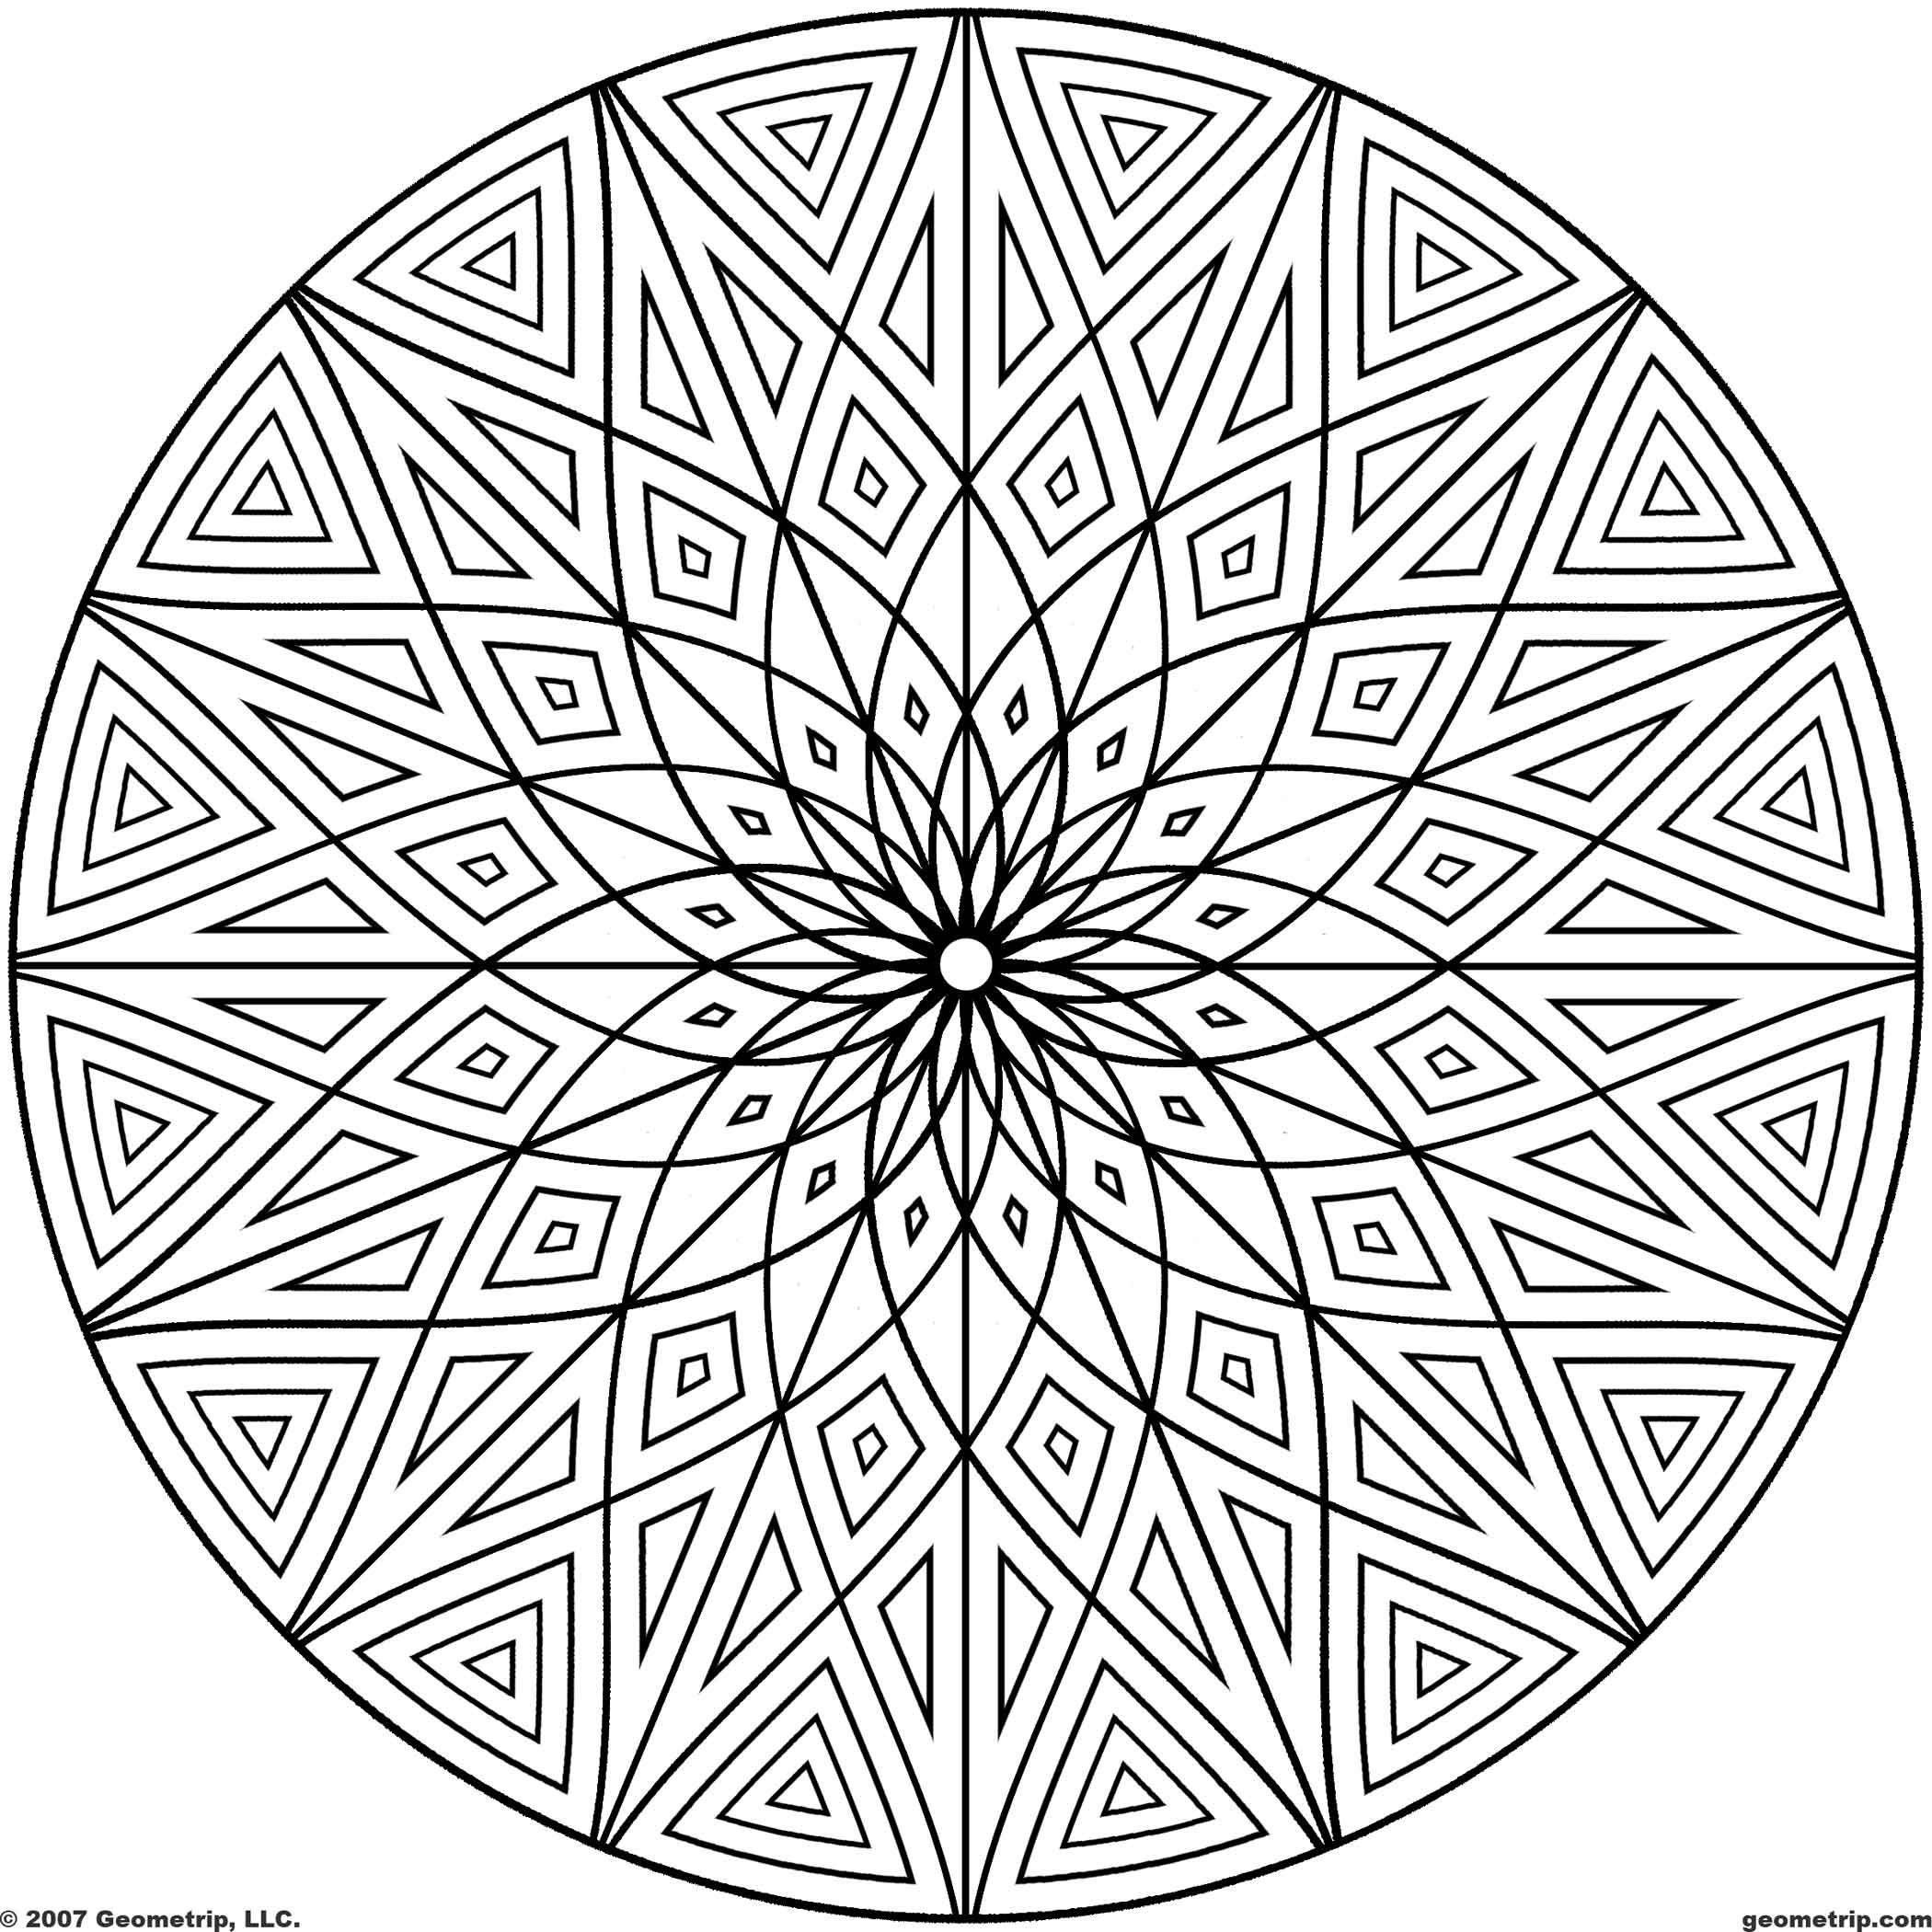 coloring circle patterns printable geometric patterns geometripcom free coloring patterns circle